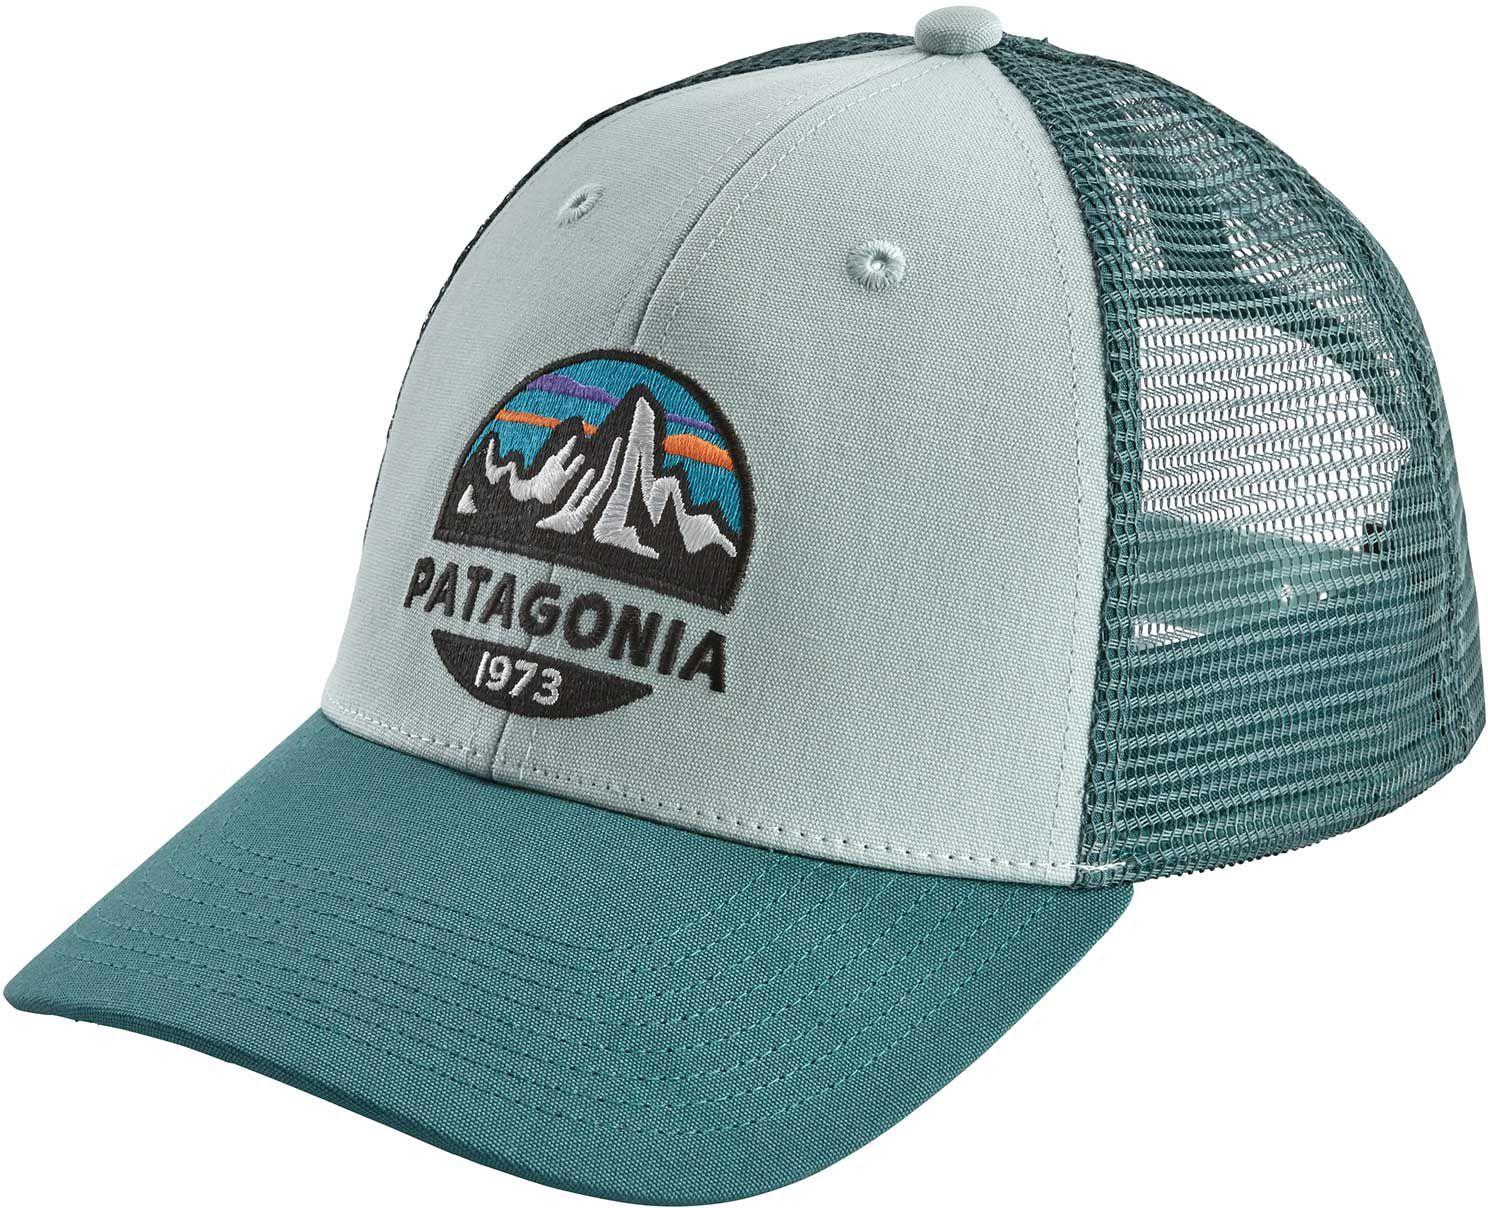 Patagonia Men's Fitz Roy Scope Lopro Trucker Hat, Atoll Blue